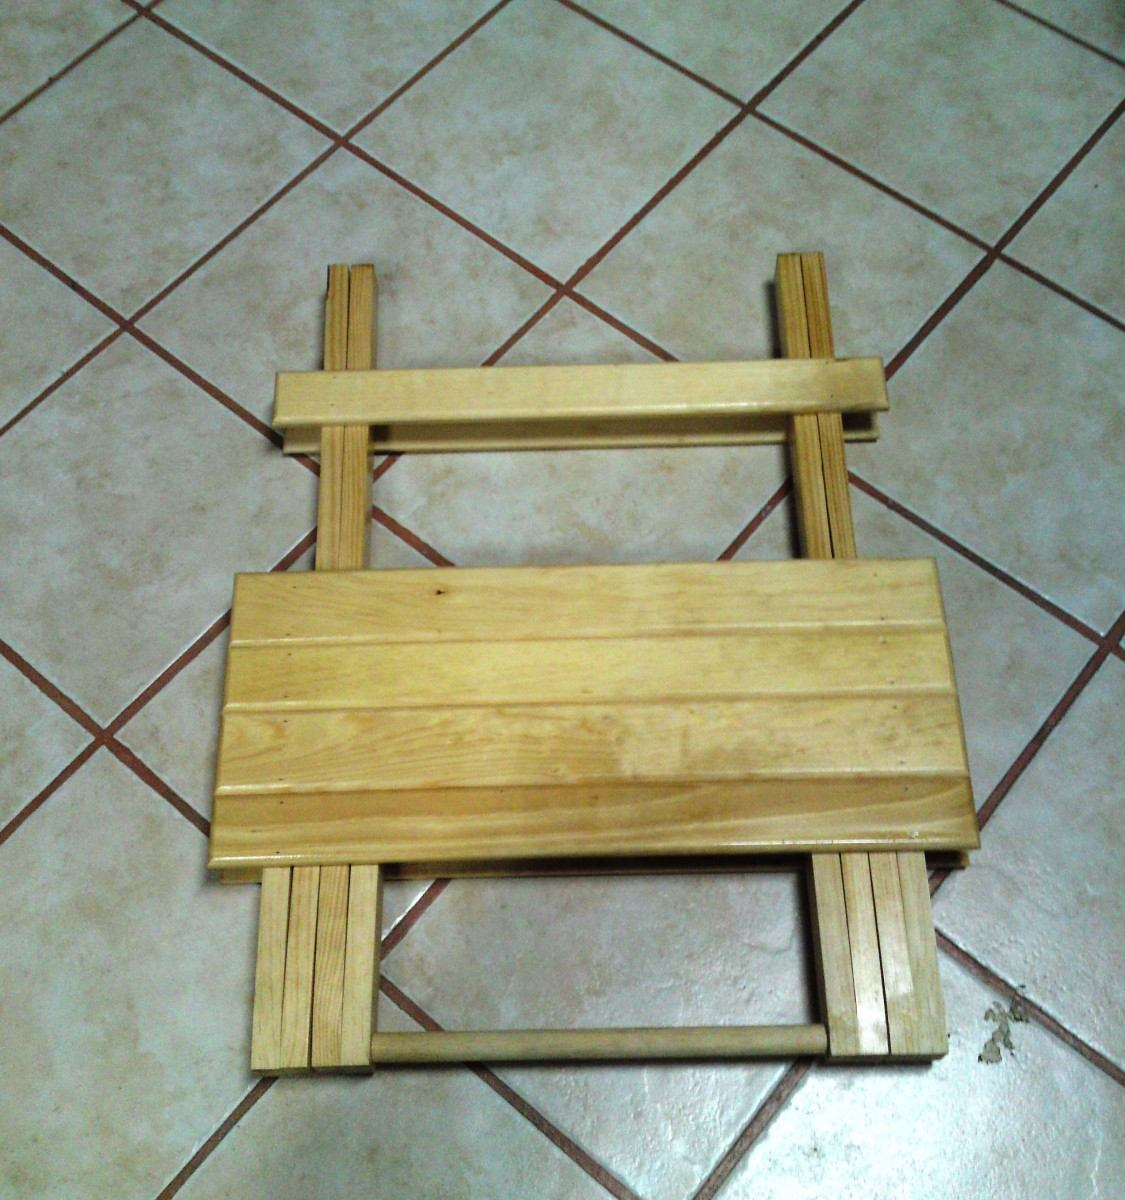 Mesa de madera plegable 68c portatil jardin o terraza - Mesa plegable madera ...